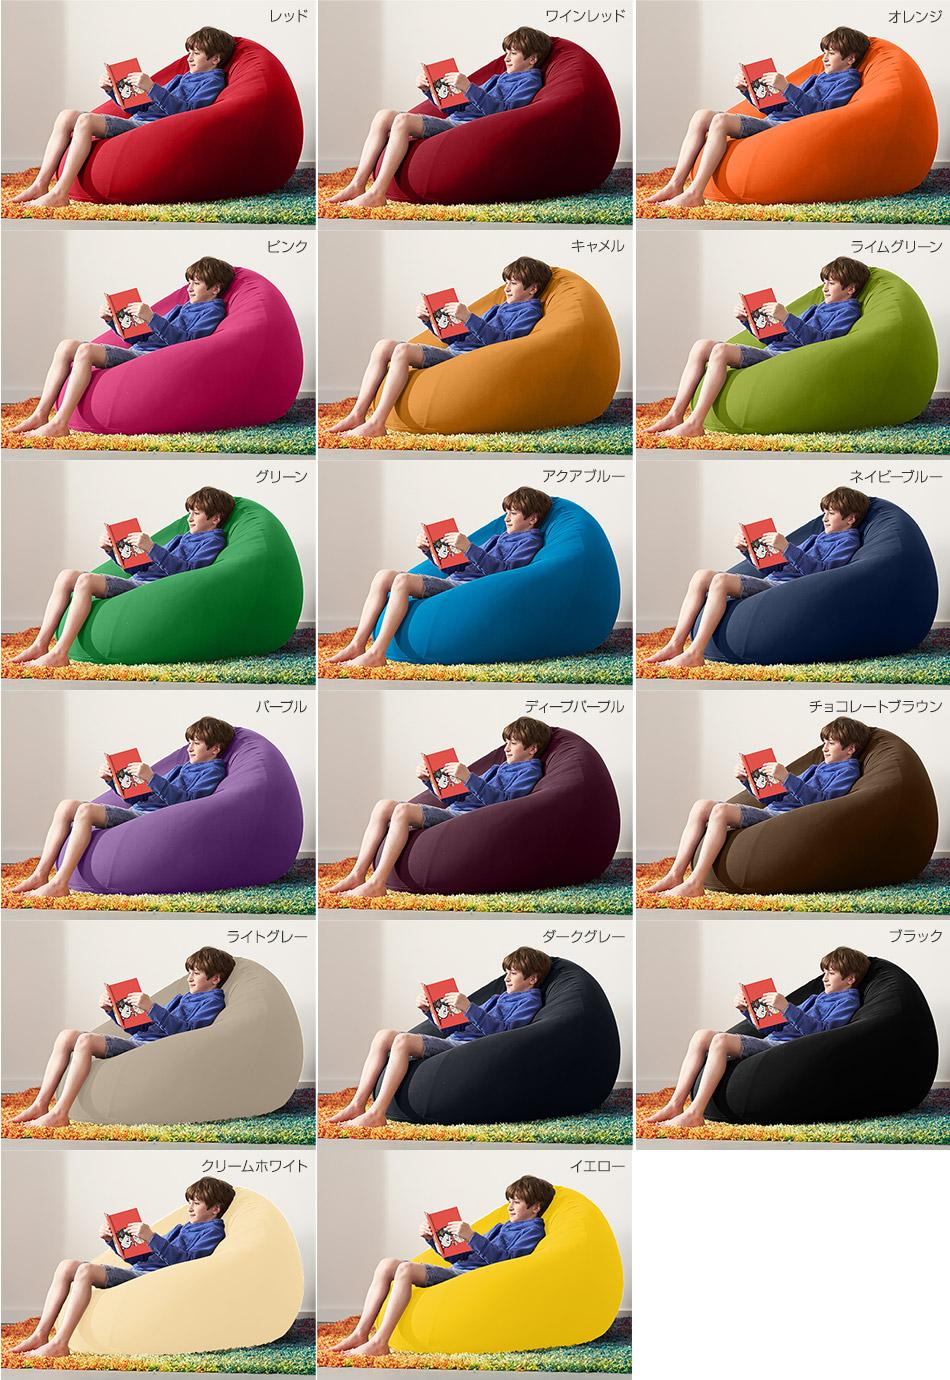 Yogibo Podは全15色の豊富なカラーがあります